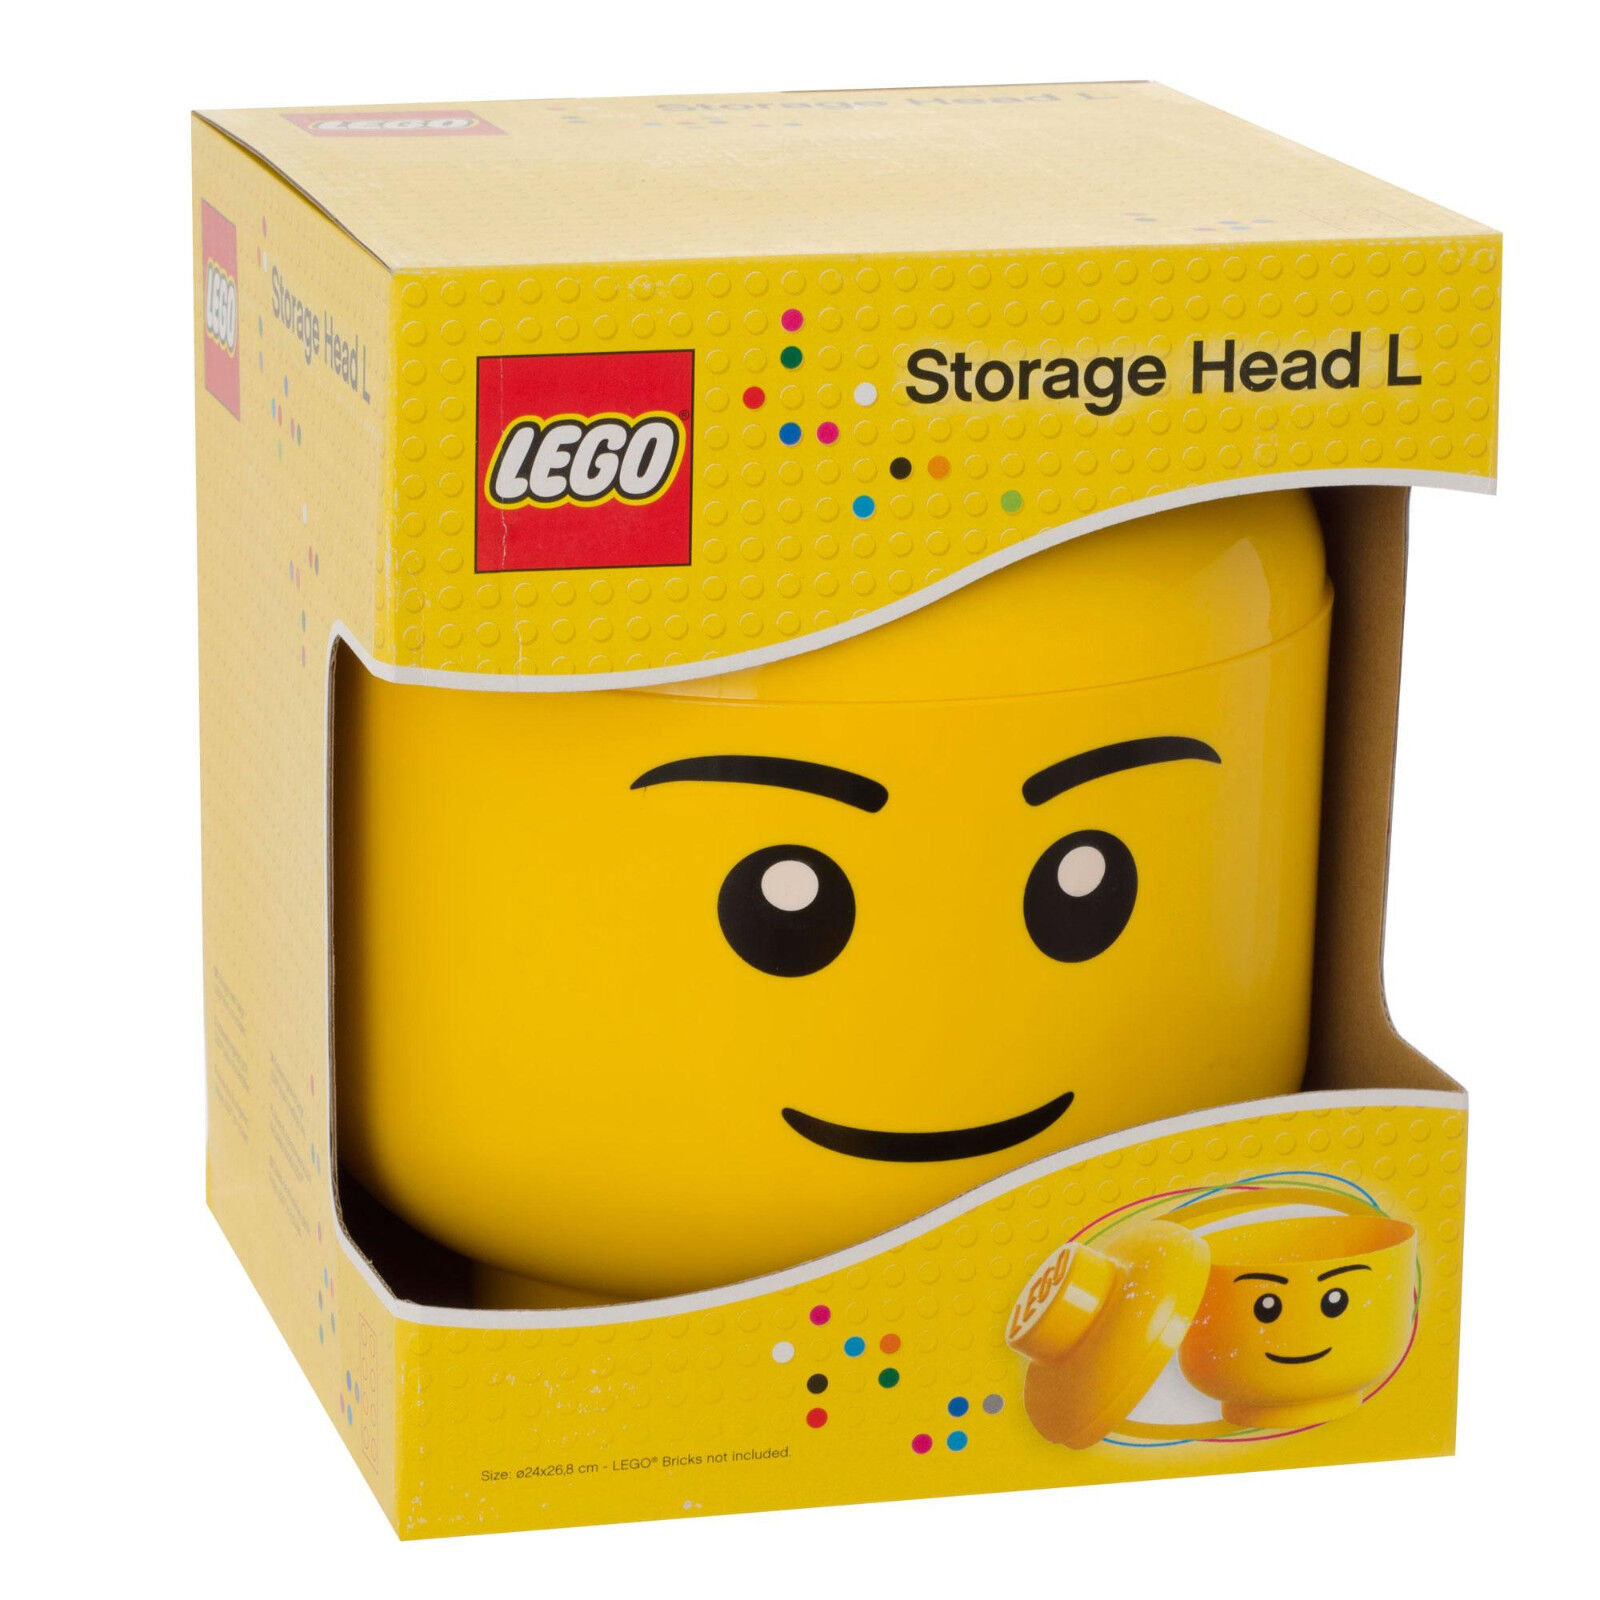 costo effettivo Lego Lego Lego gree gituttio Storage Minicifra Head Boy L RETIrosso - Bre nuovo & Sealed  grandi offerte